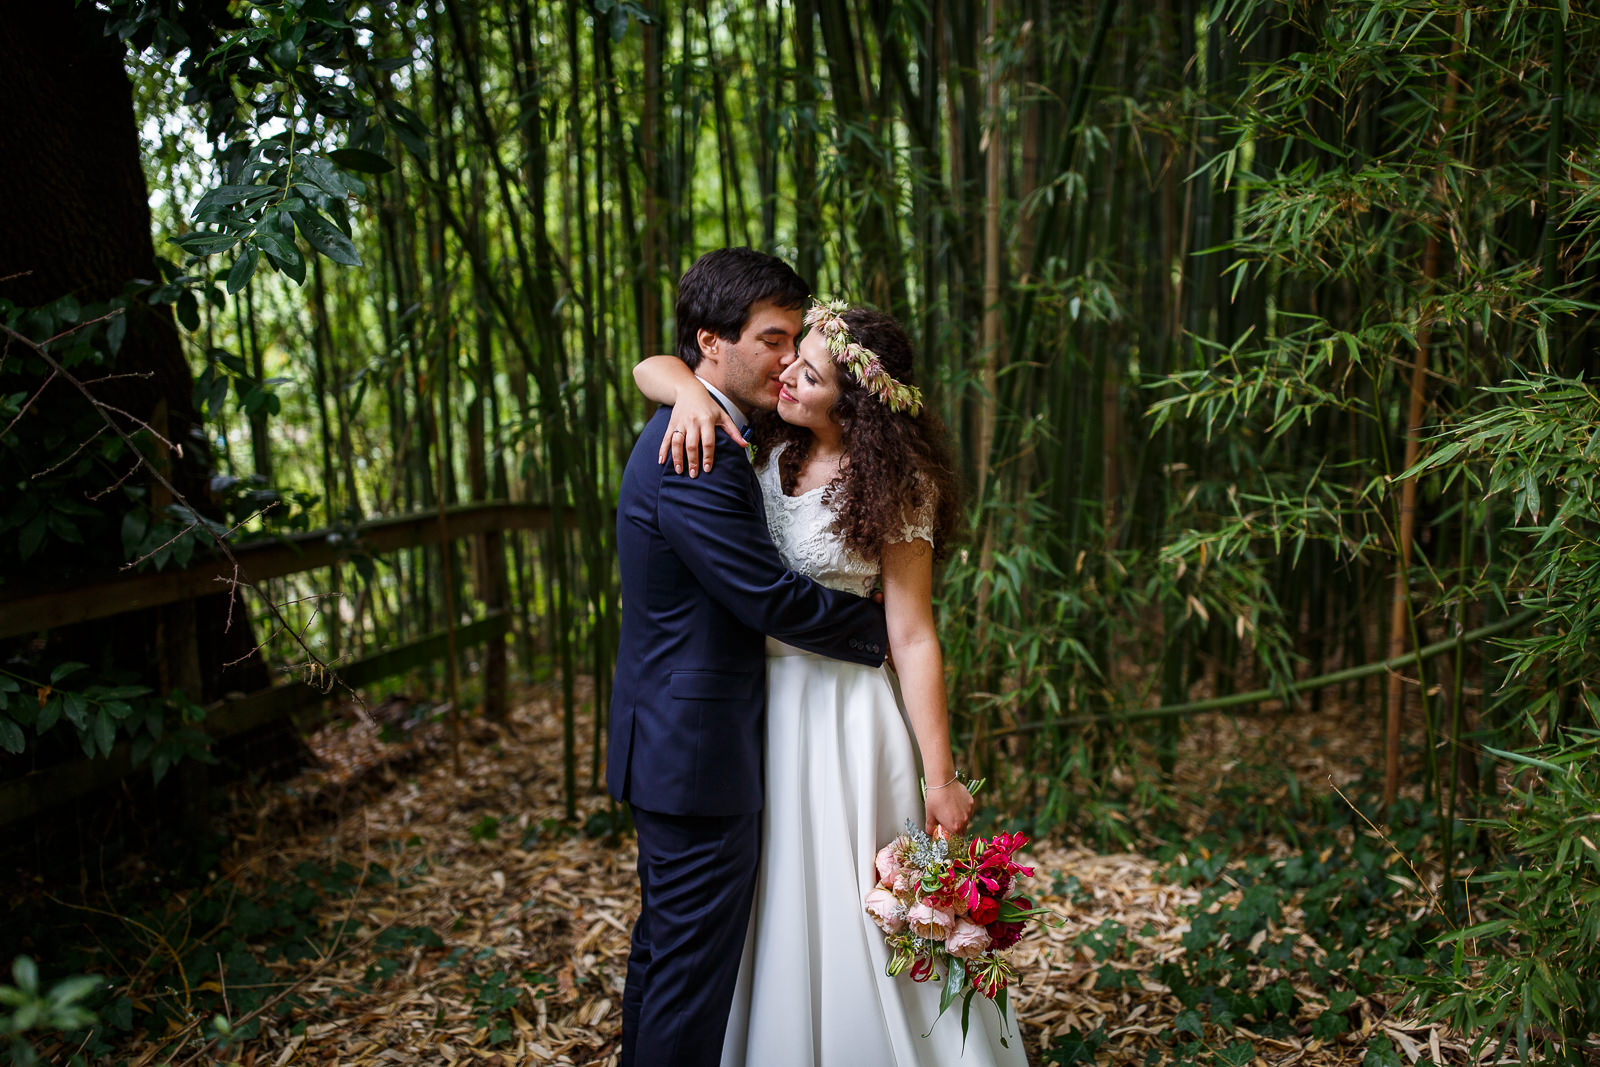 casamento_Adriana_e_Joao_5D1_6714.jpg